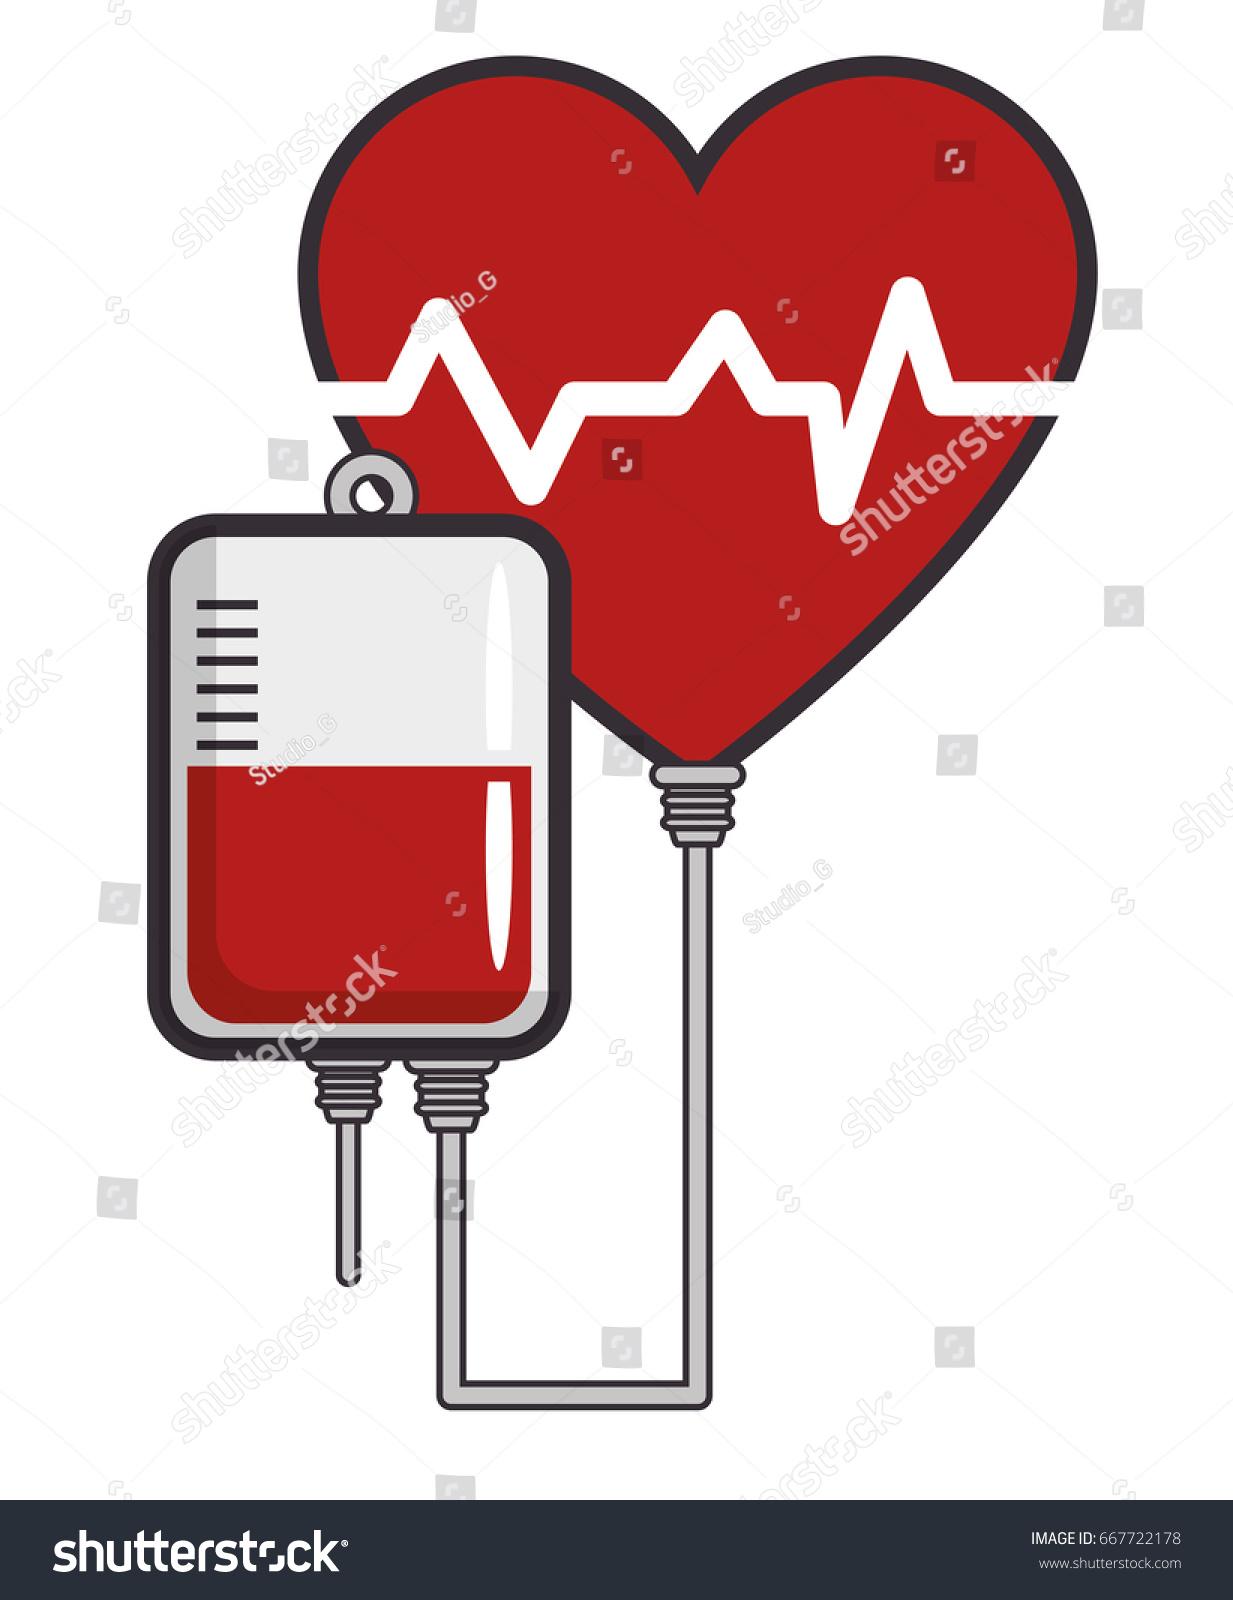 Blood donation symbol stock vector 667722178 shutterstock blood donation symbol buycottarizona